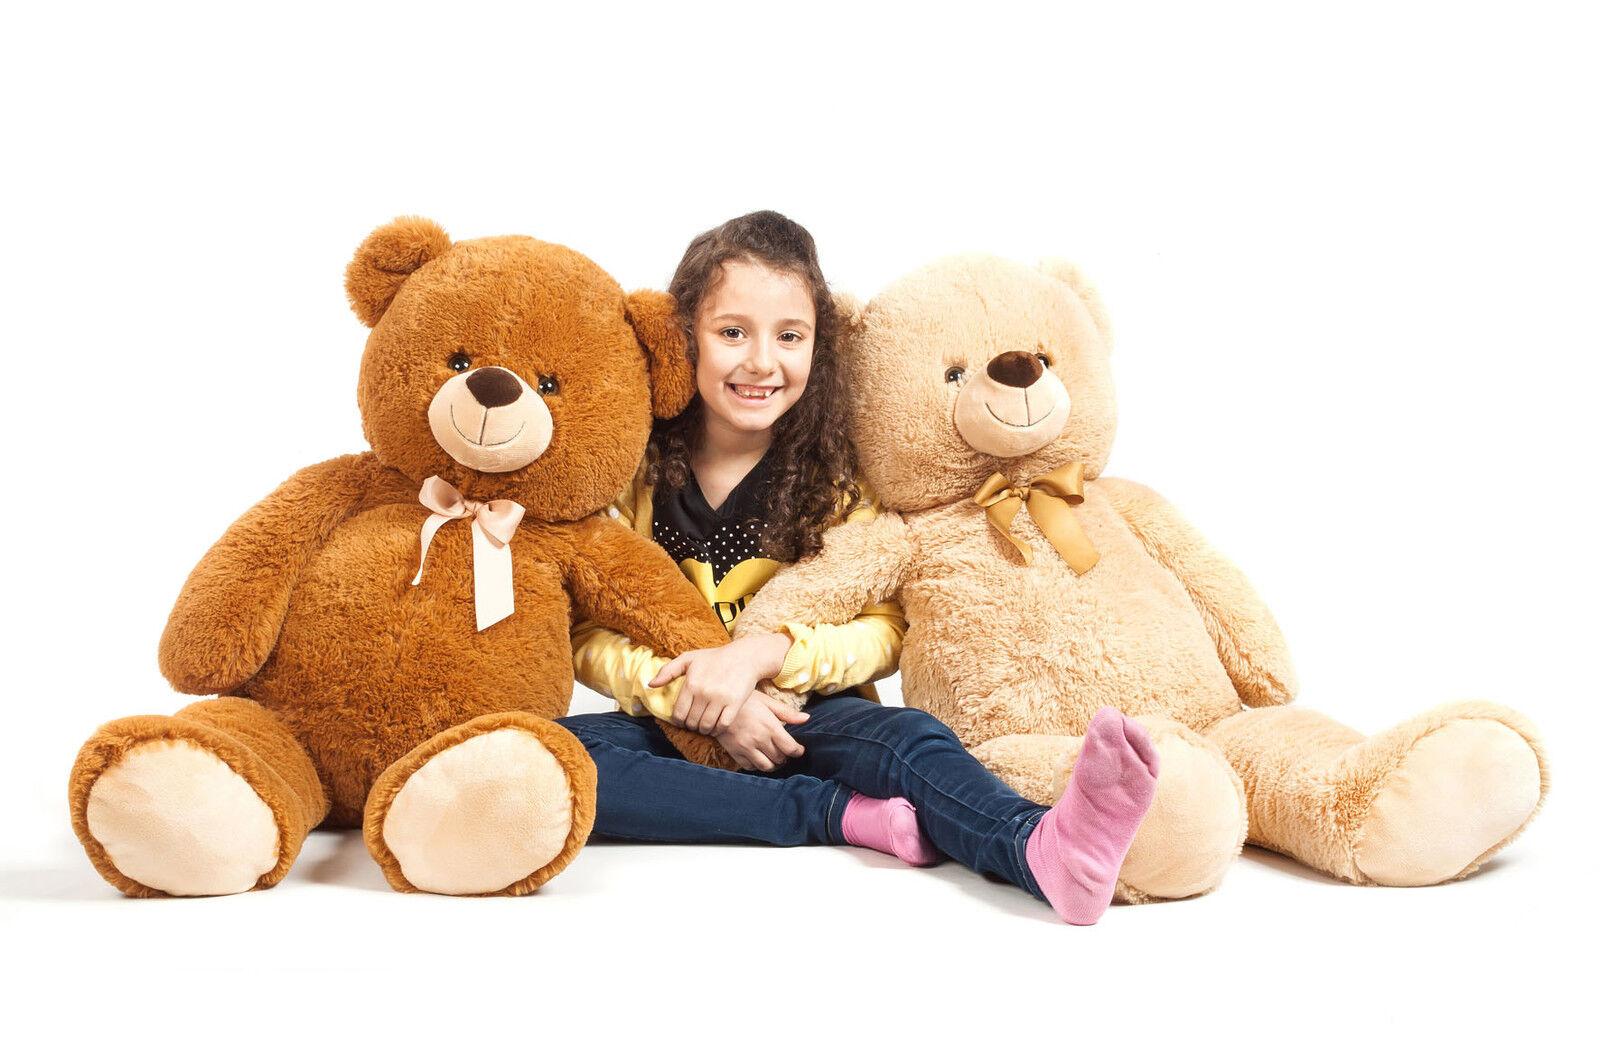 Grand Bear plush XXL all soft H 100 cm Brown Giant Pooh 1m